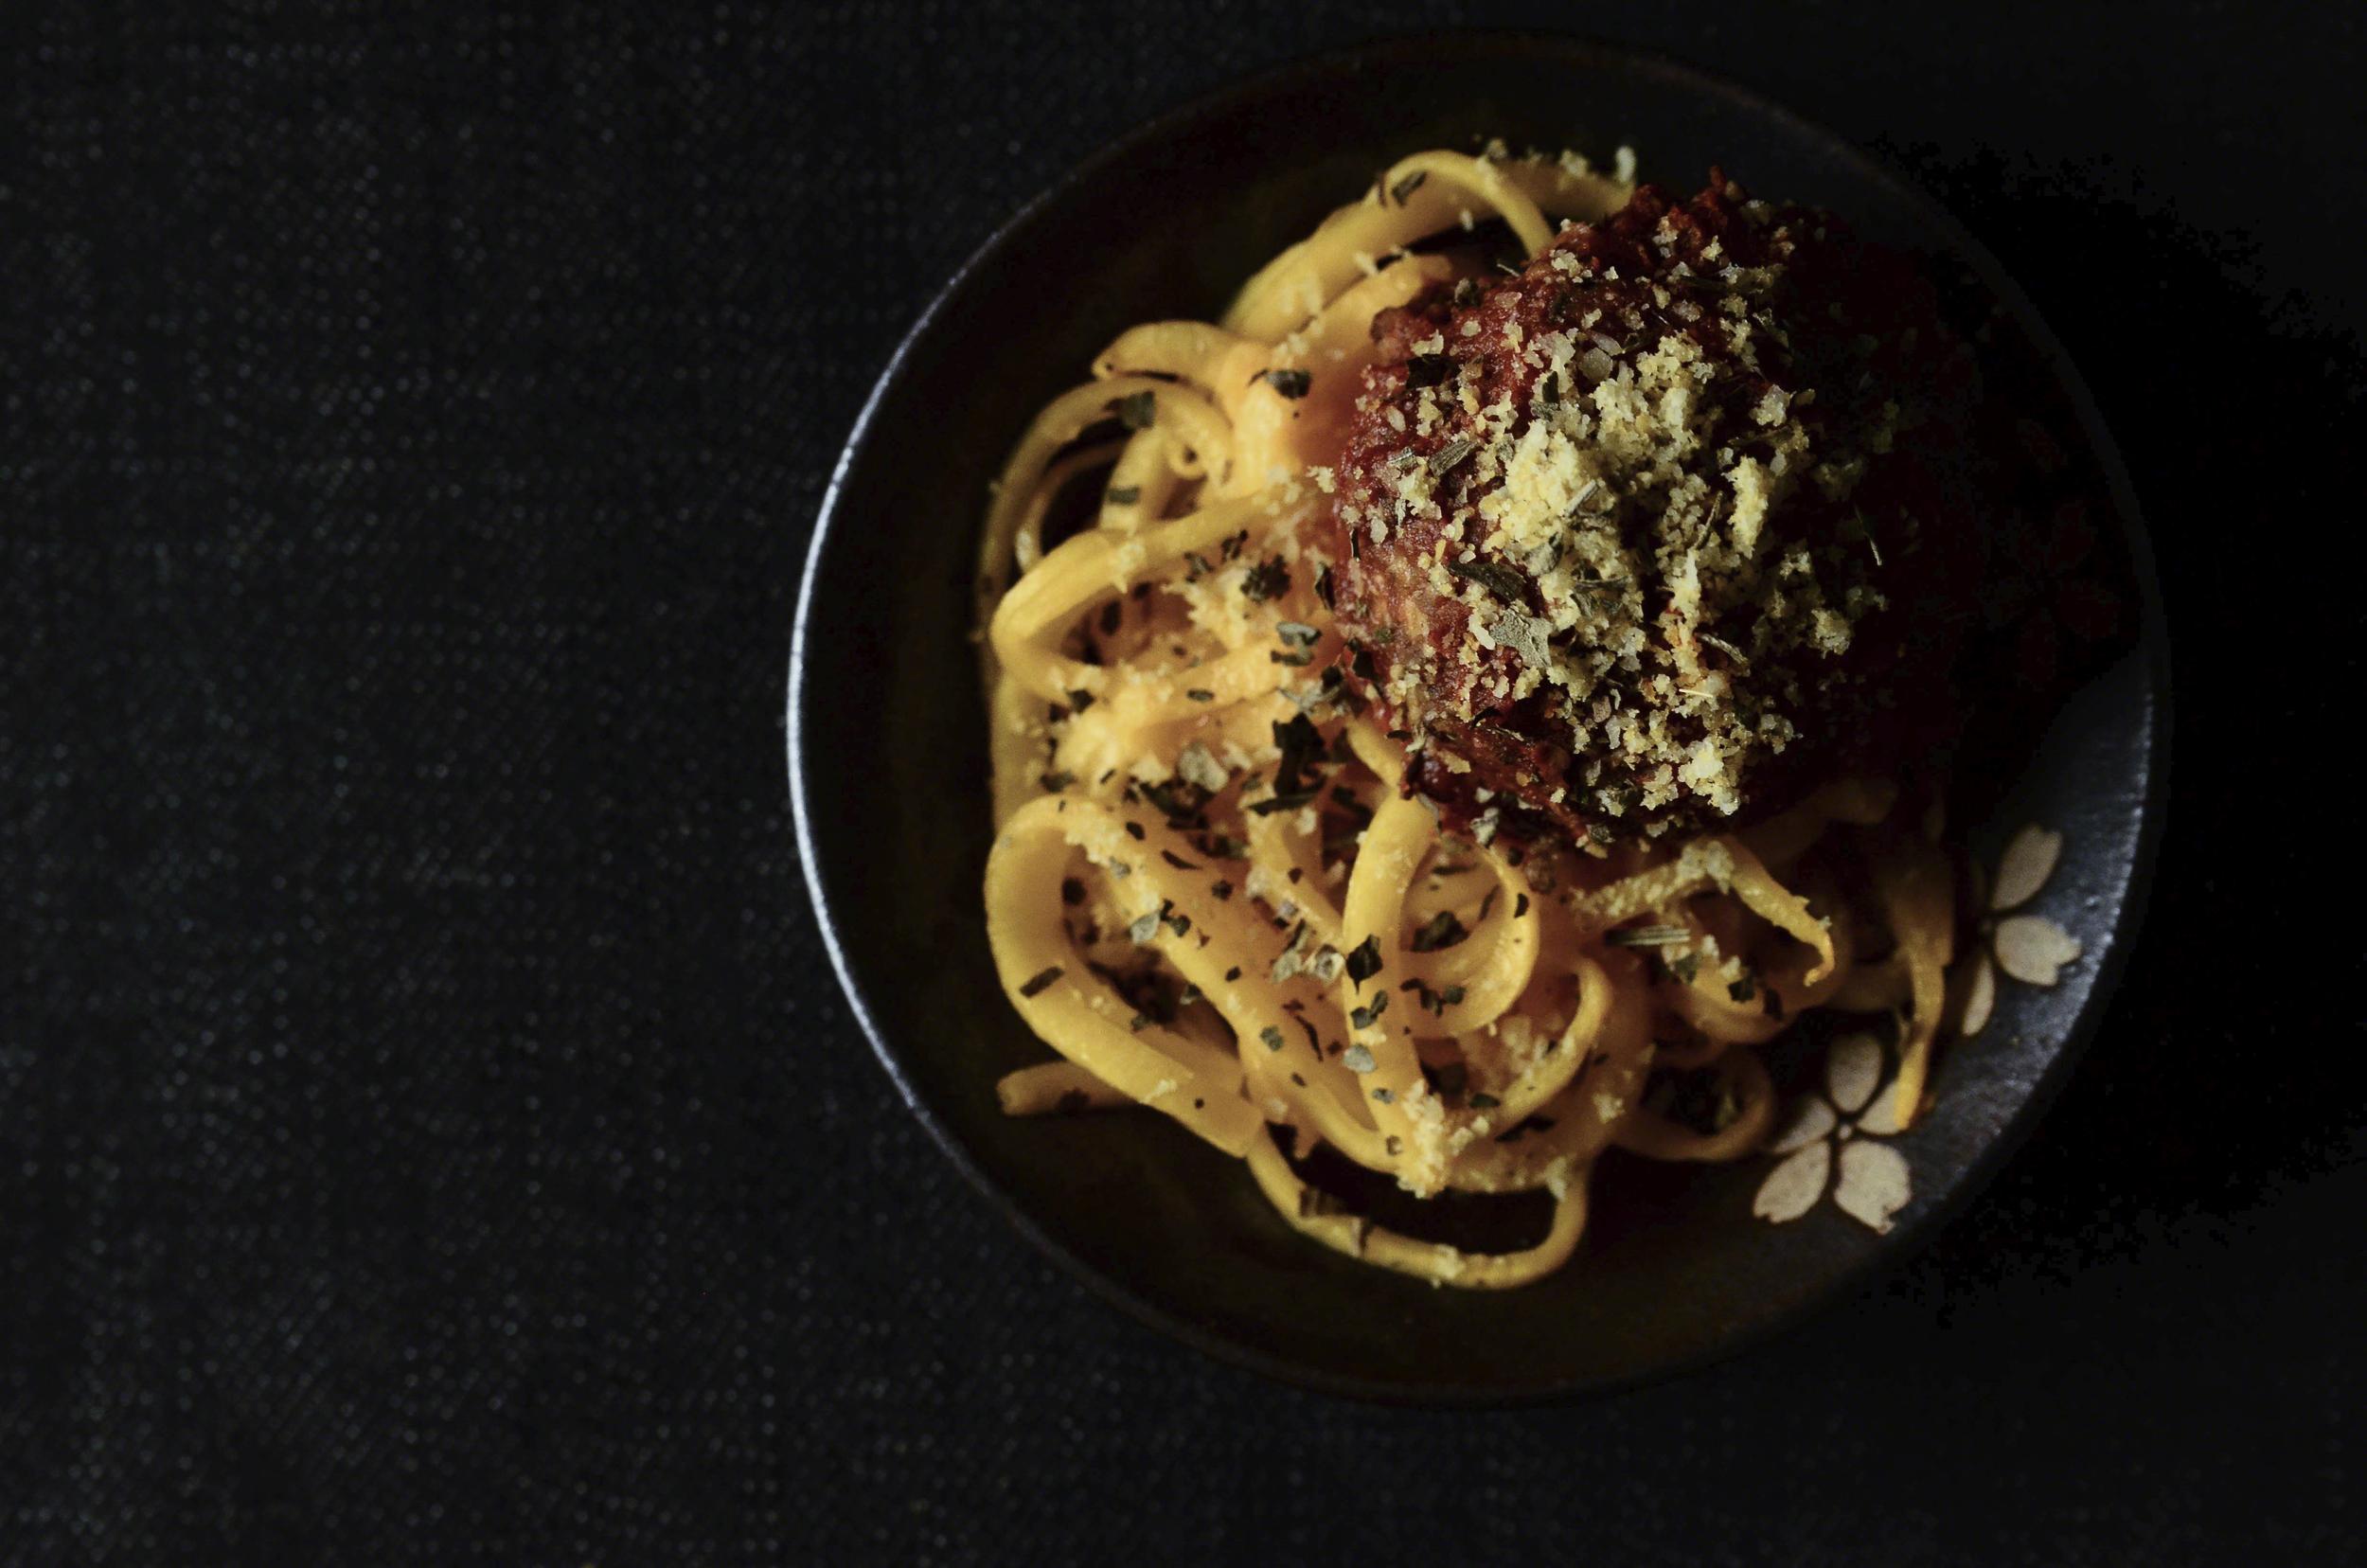 Quinoa, Oat, Cauliflower, Walnut, & Black Bean Vegan Meatballs with Marinara & Butternut Squash Noodles topped with Almond Coconut Parmesan & Basil | Seed Plant Water Grow